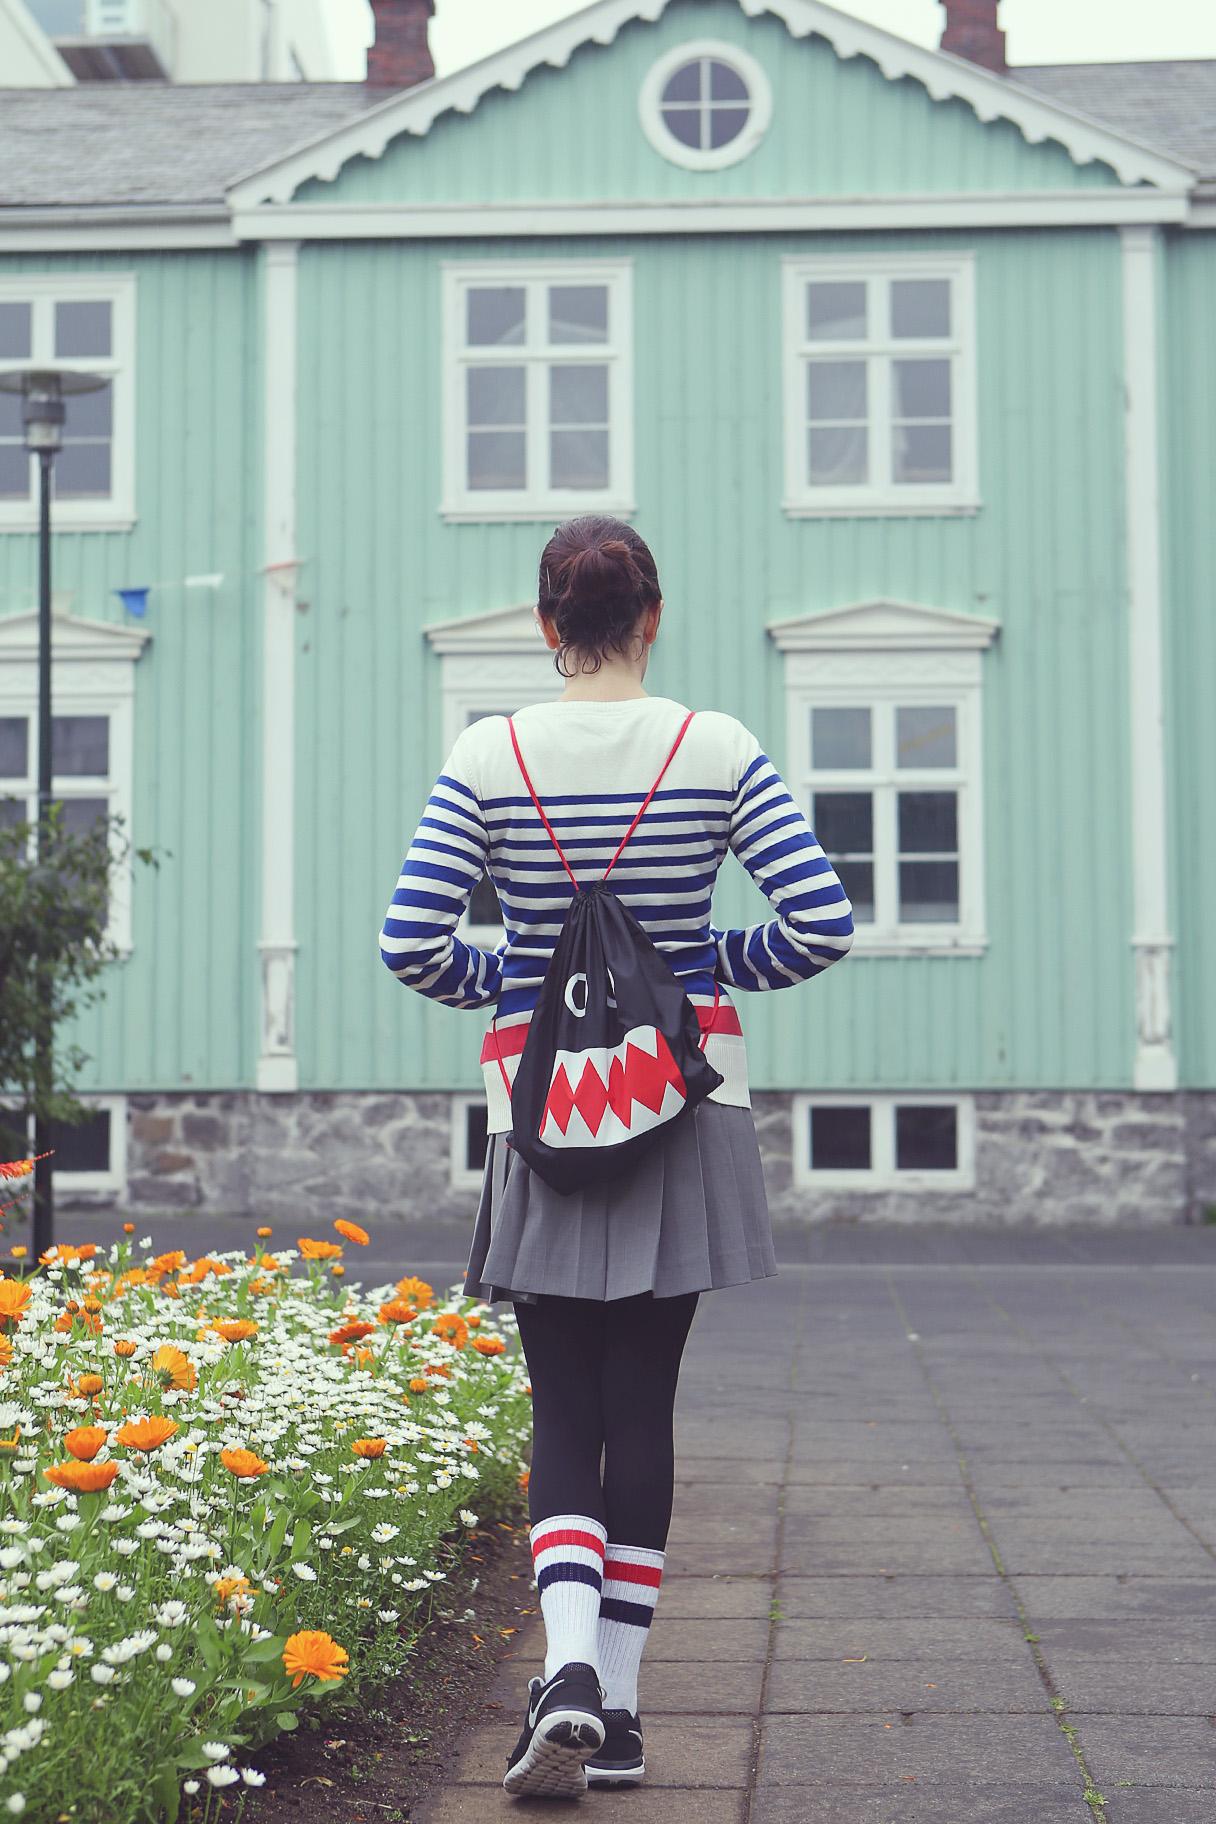 Walking in Reykjavik - 10